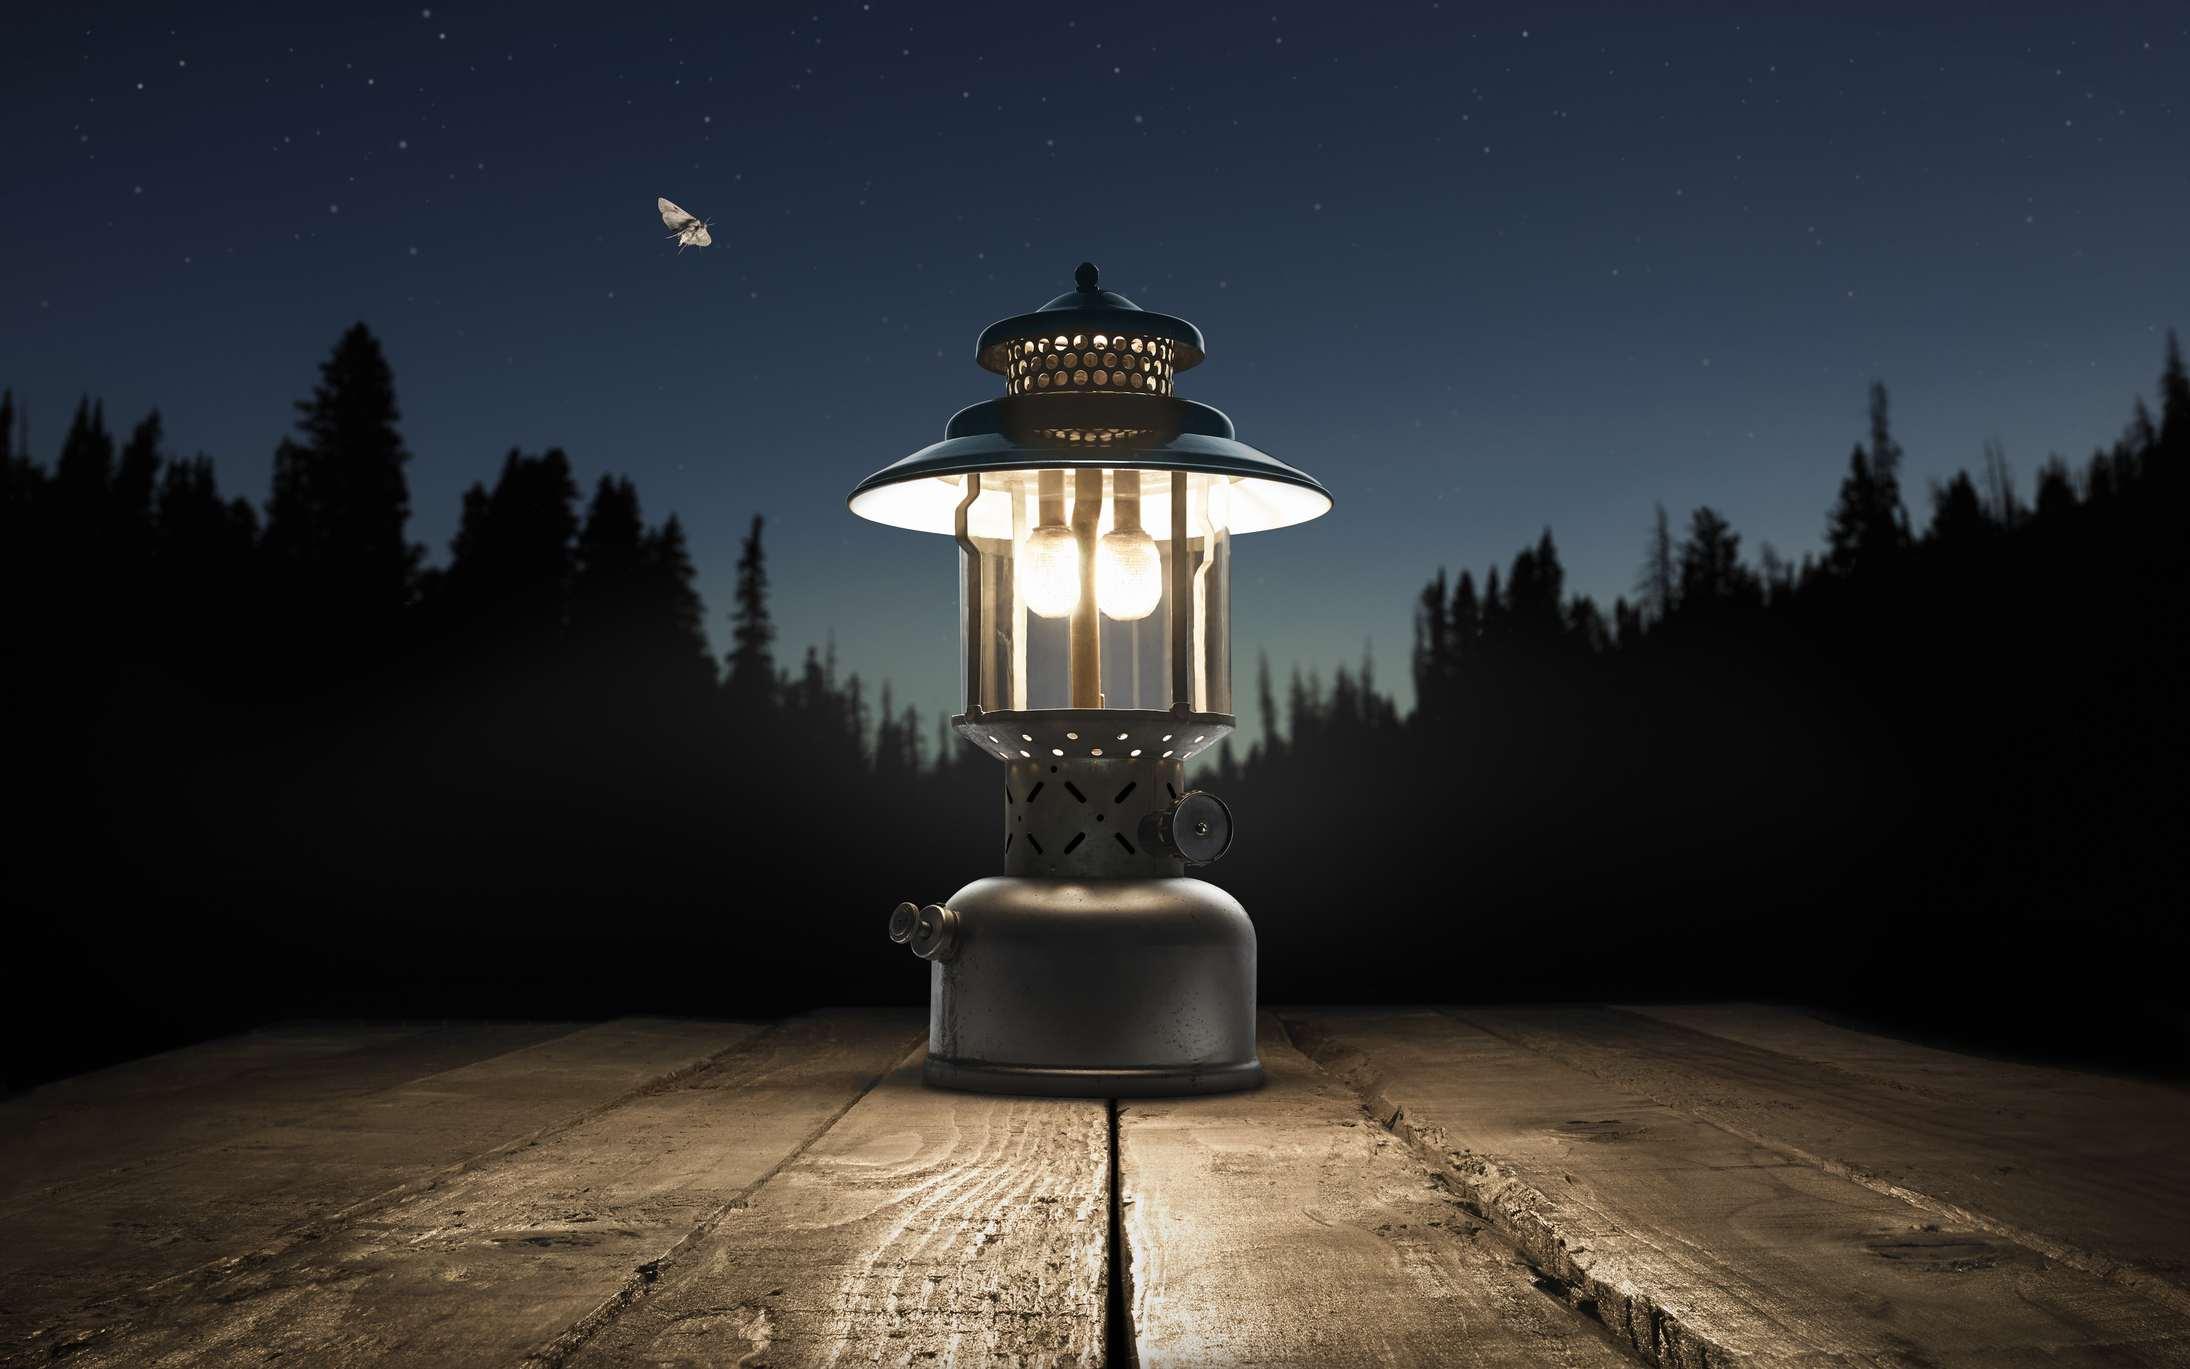 A camping lantern.